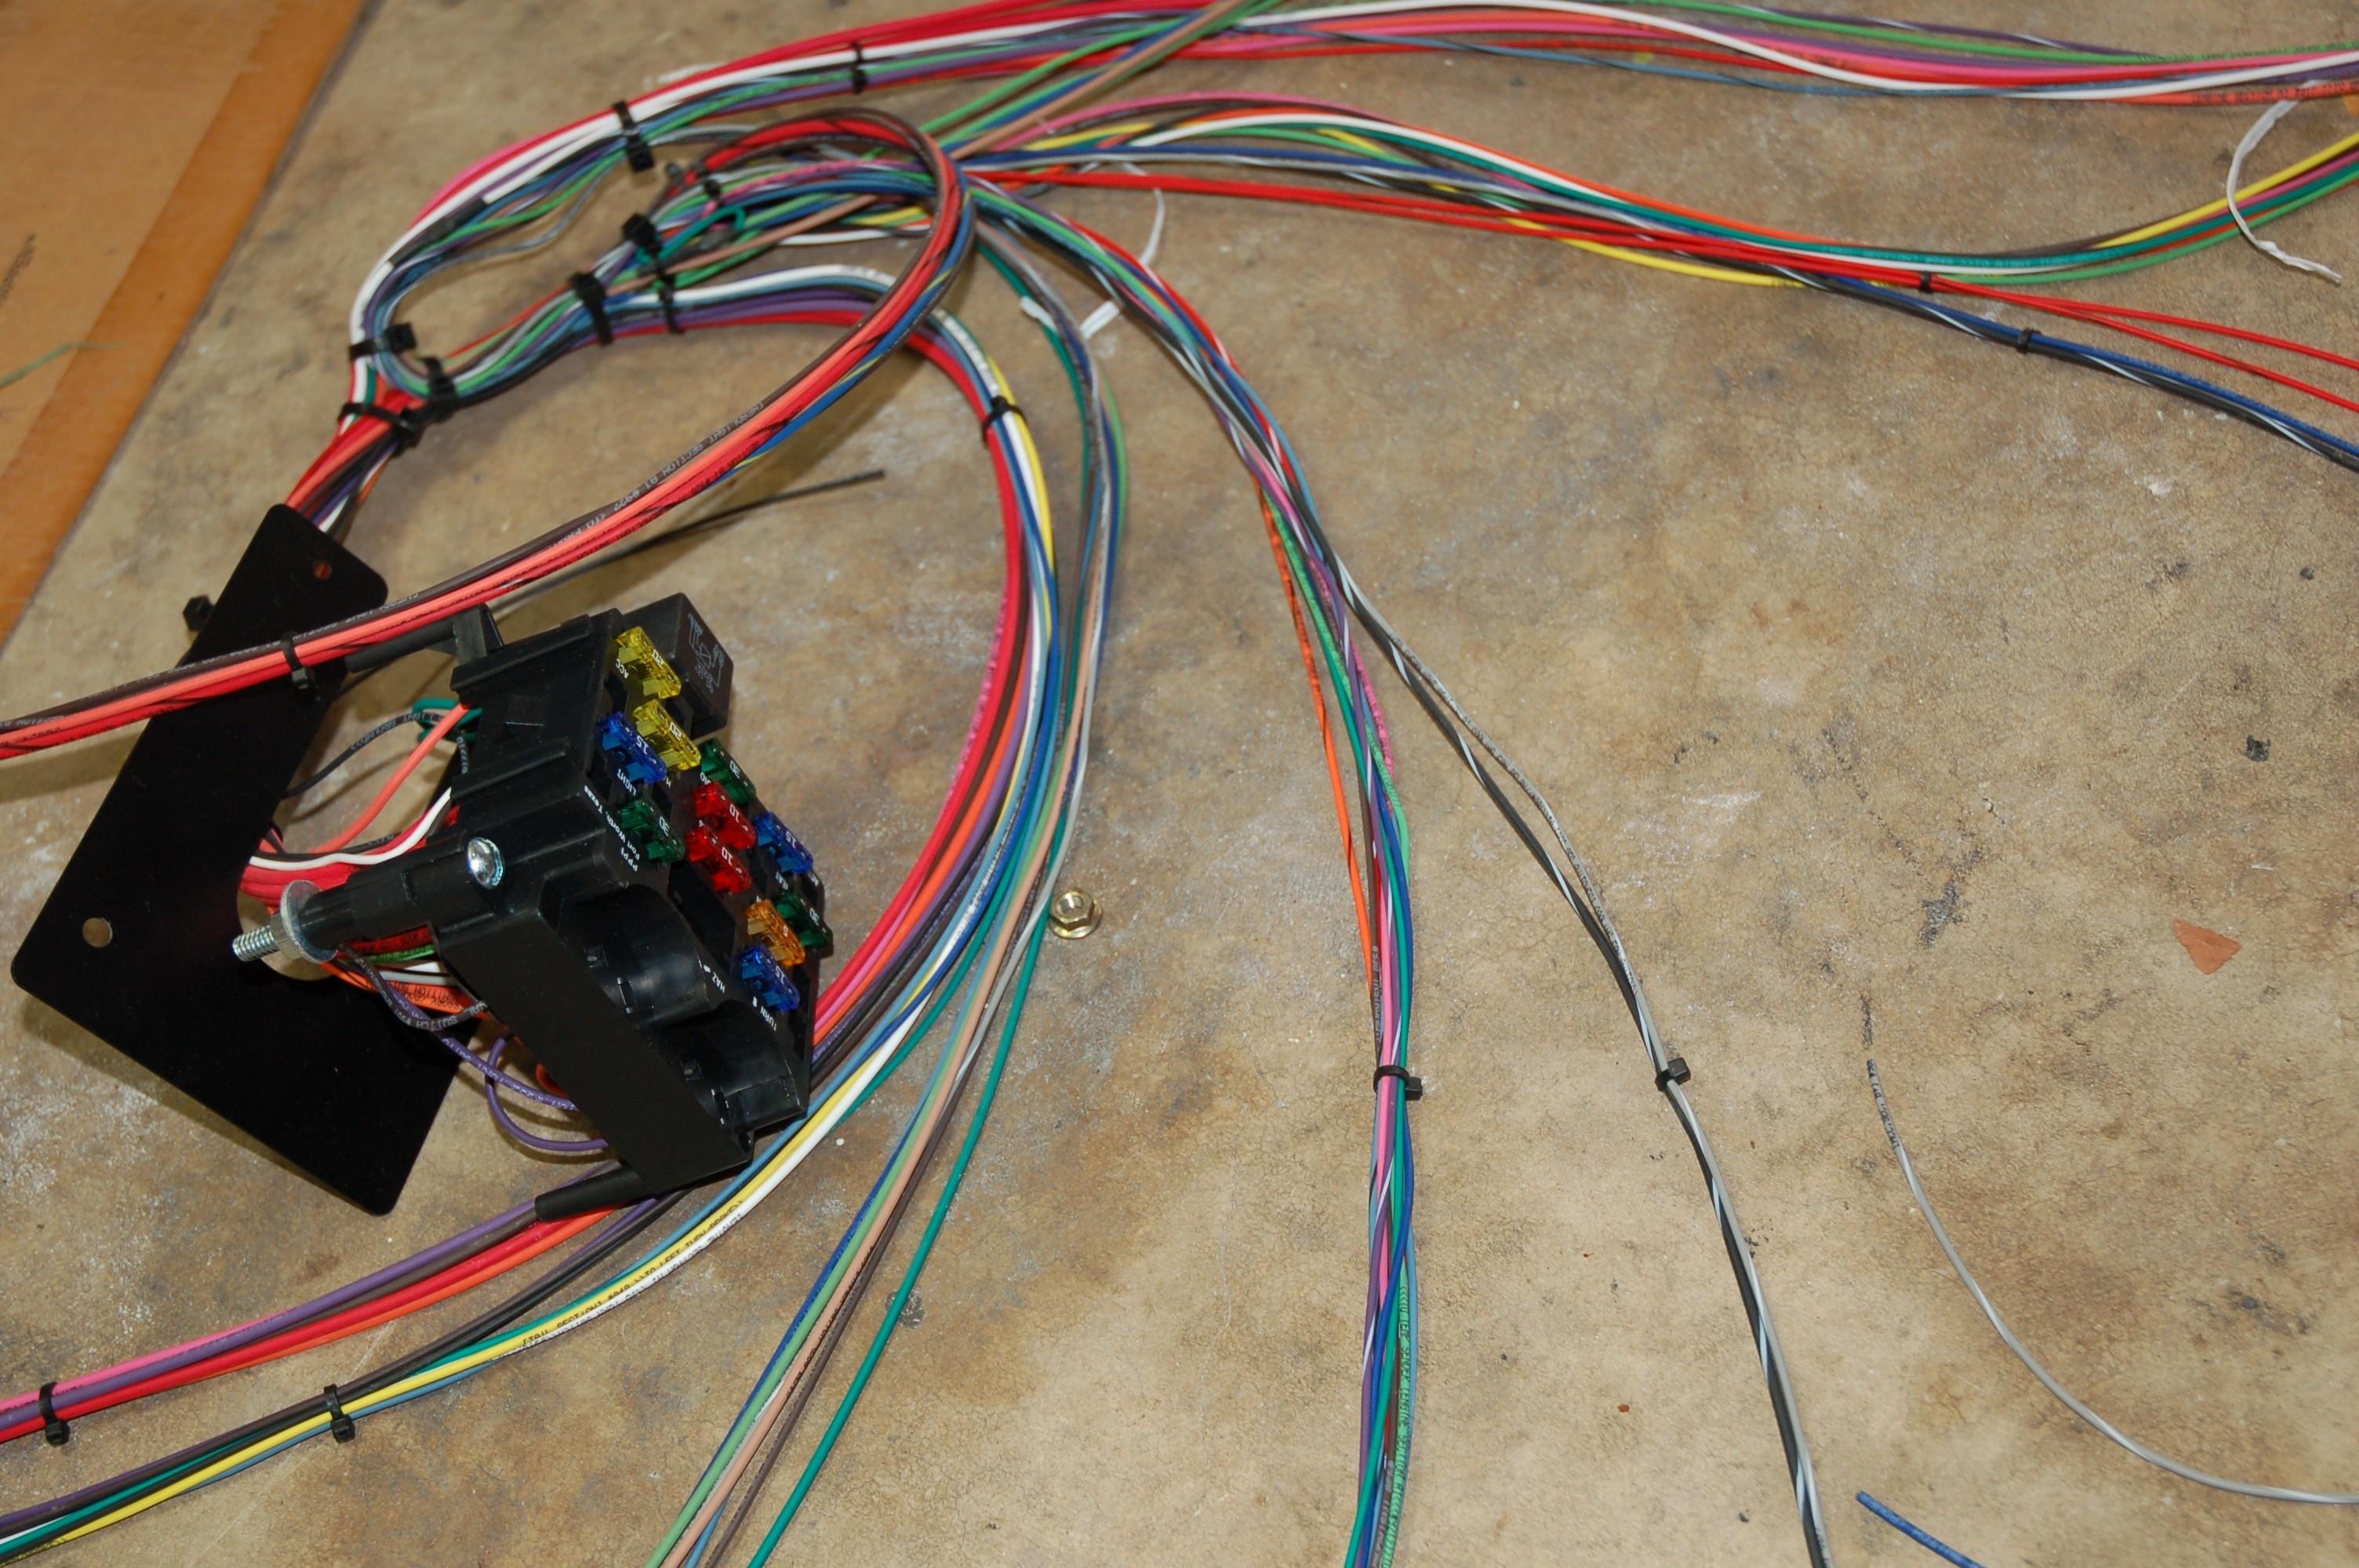 Will A Yamaha Kodiak 450 Wiring Harness Work On A 400 533a763 Universal Wiring Harness Adapter Diagram Of Will A Yamaha Kodiak 450 Wiring Harness Work On A 400